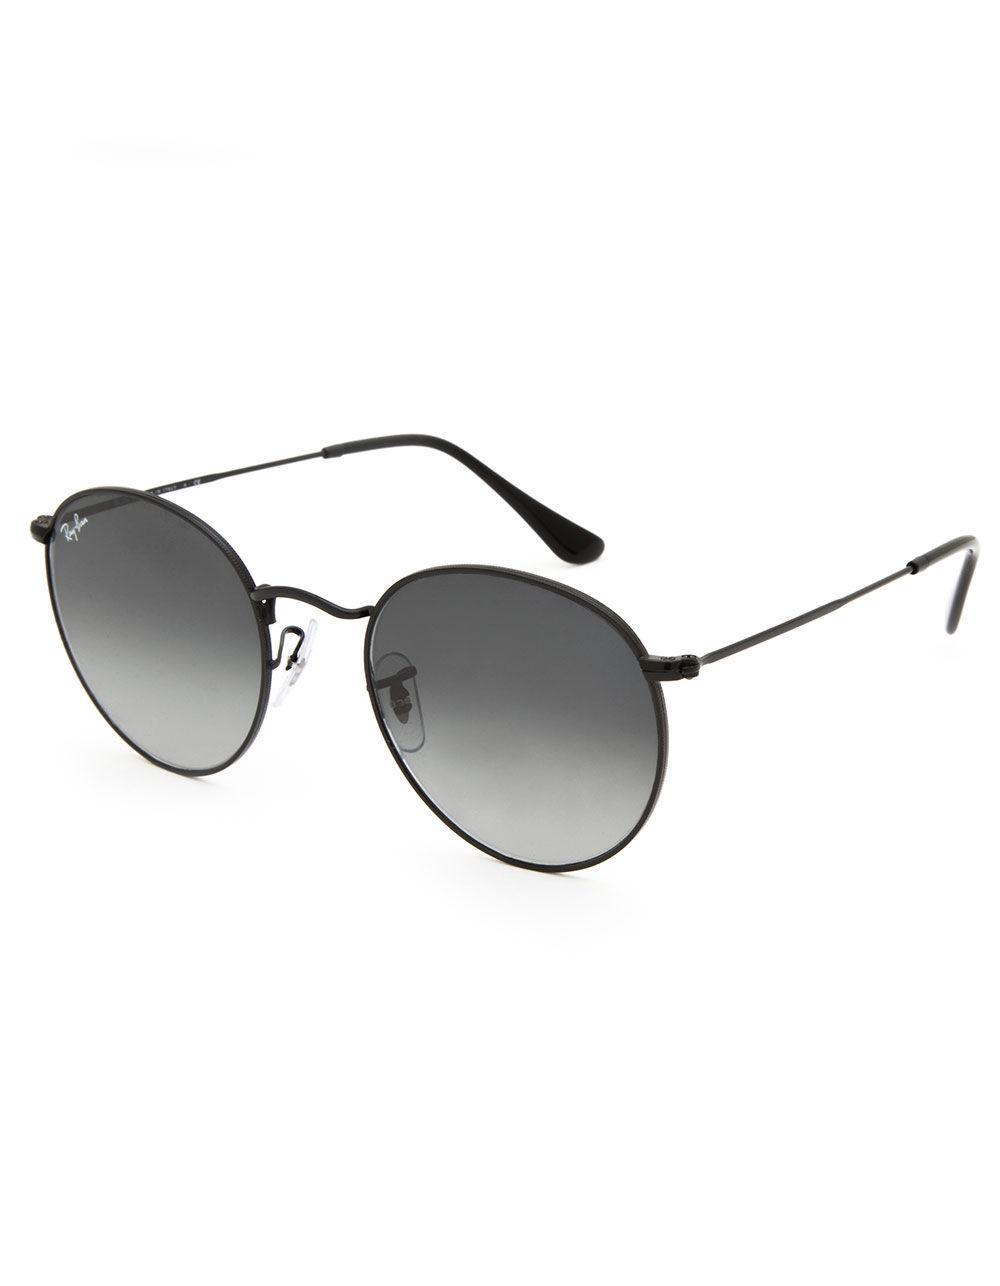 4c87824647 Lyst - Ray-Ban Round Flat Lenses Grey Gradient   Black Sunglasses in ...